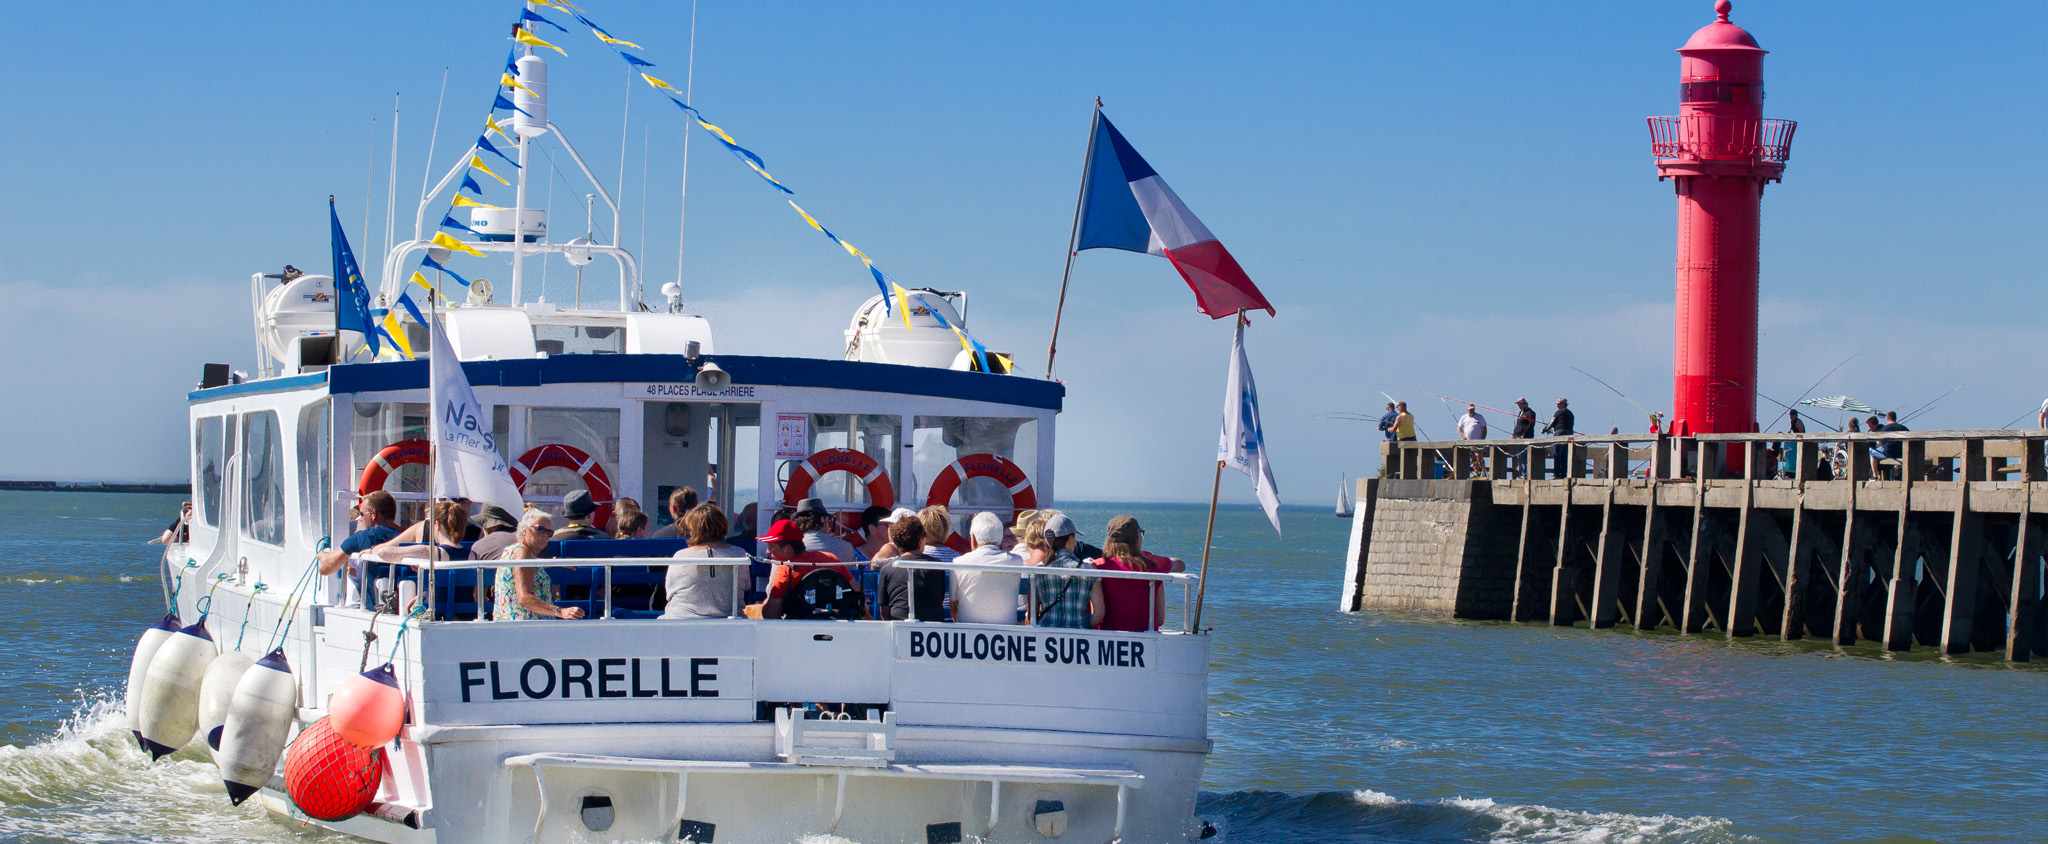 [Image: promenade_en_mer-boulognesurmer_leflorelle.jpg]